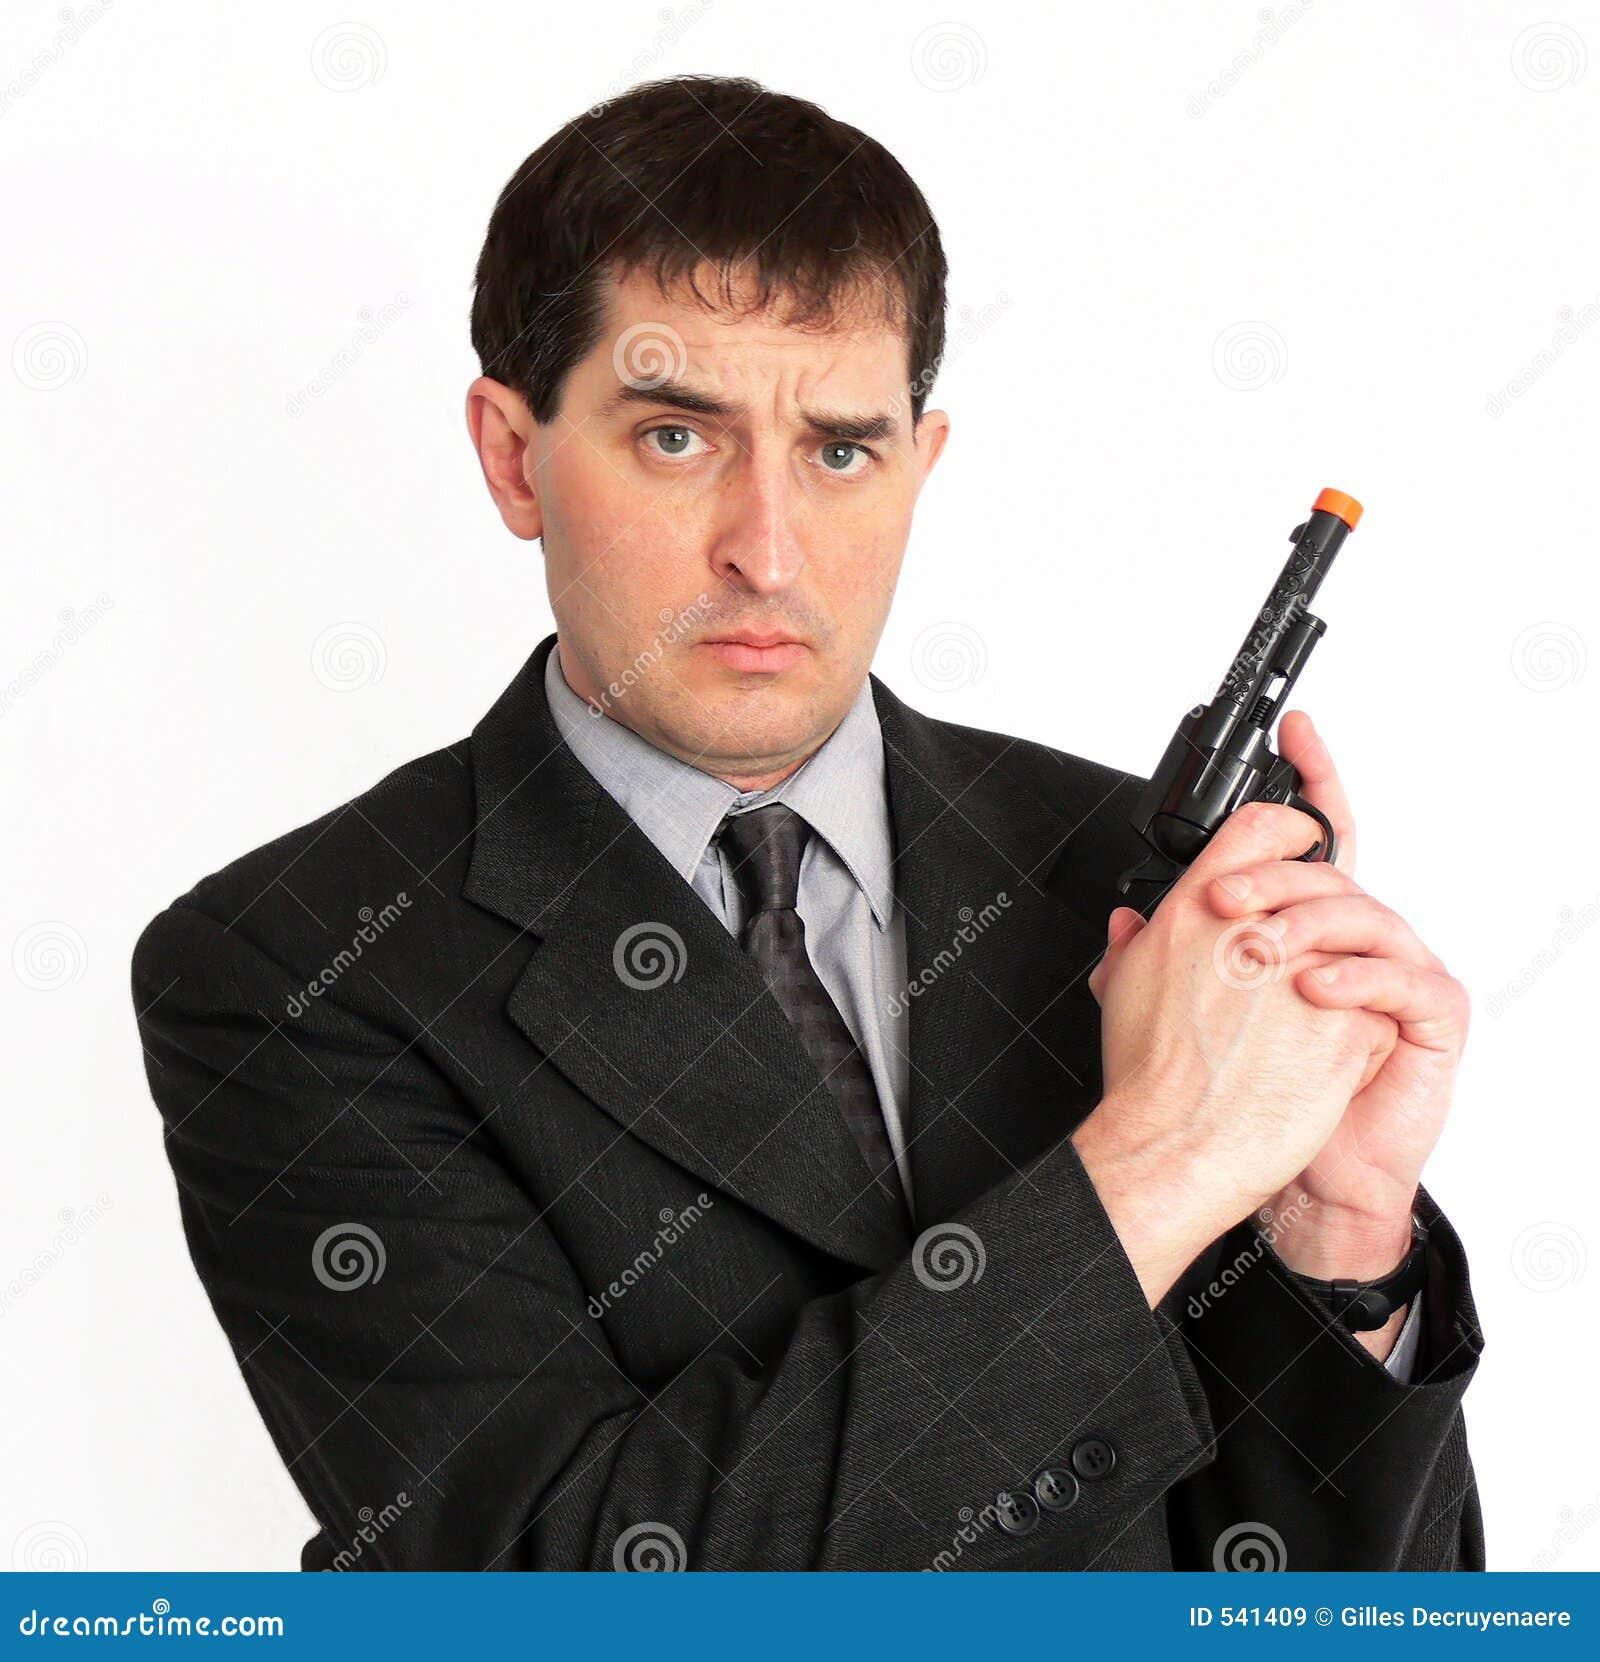 Download 枪顶层 库存图片. 图片 包括有 威胁, 手枪, 争取, 间谍, 射击者, 债券, 姿势, 人们, 危险, 射击 - 541409